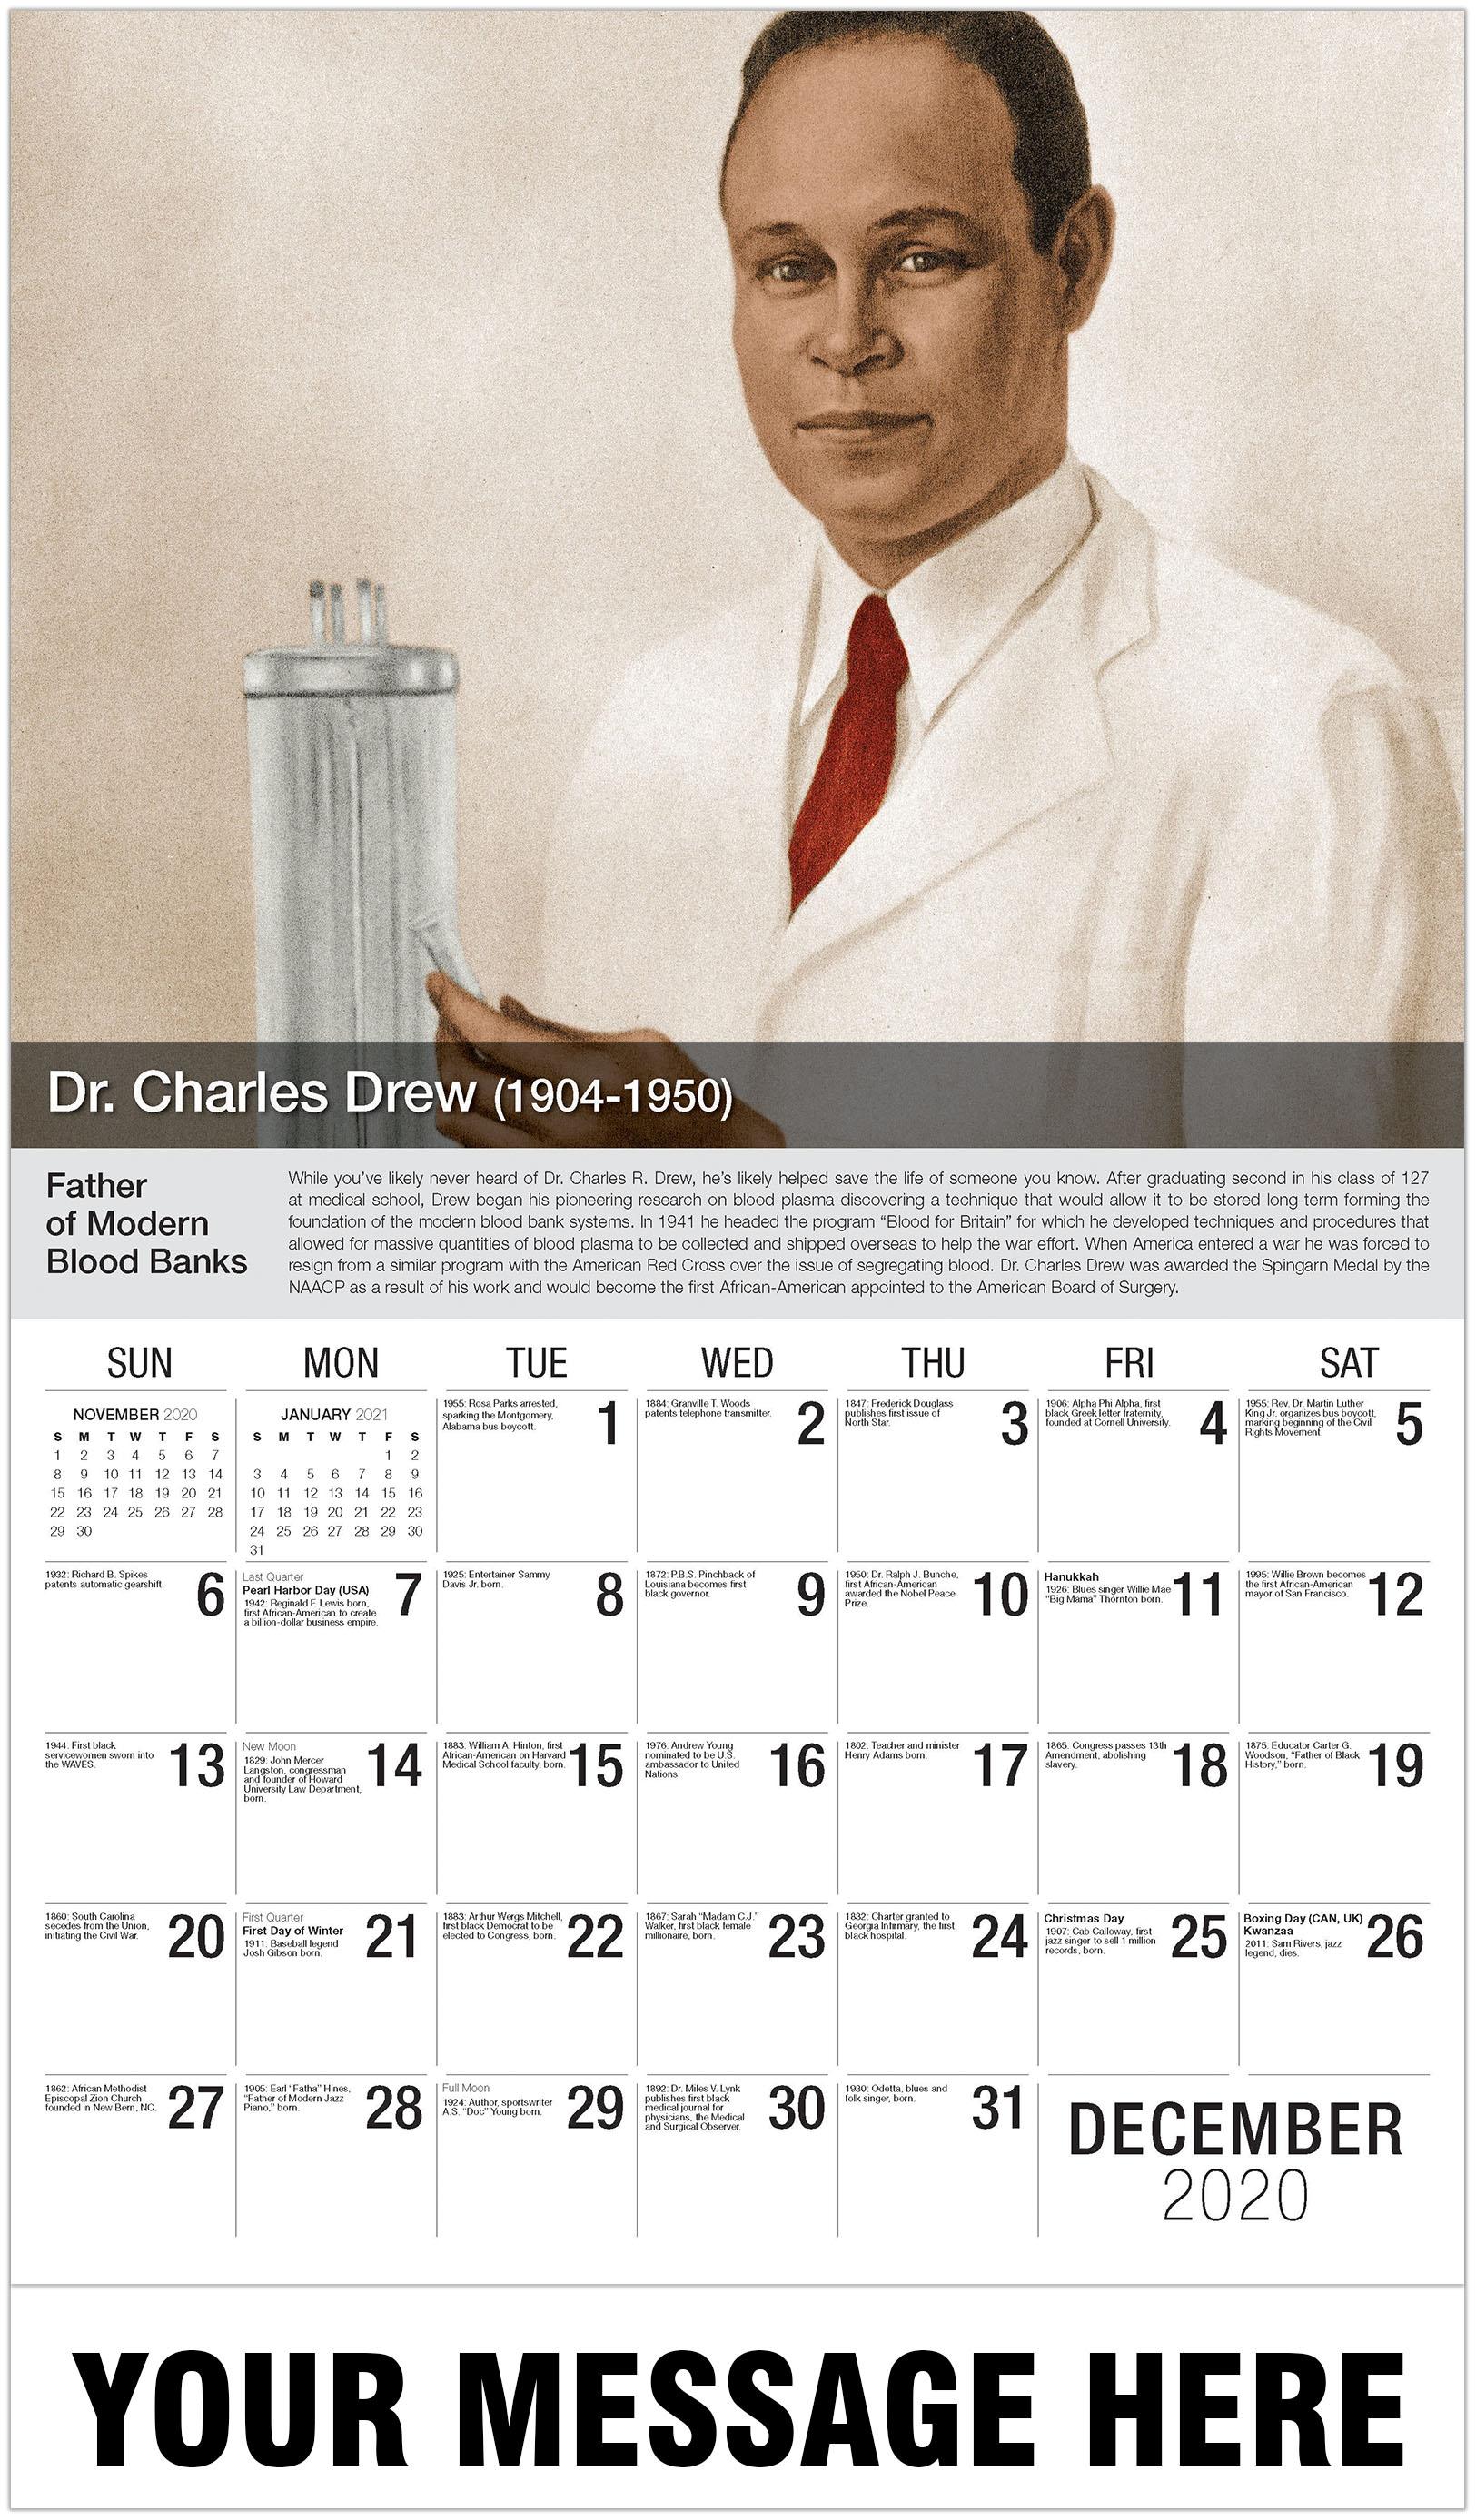 Charles Drew - December 2020 - Black History 2021 Promotional Calendar